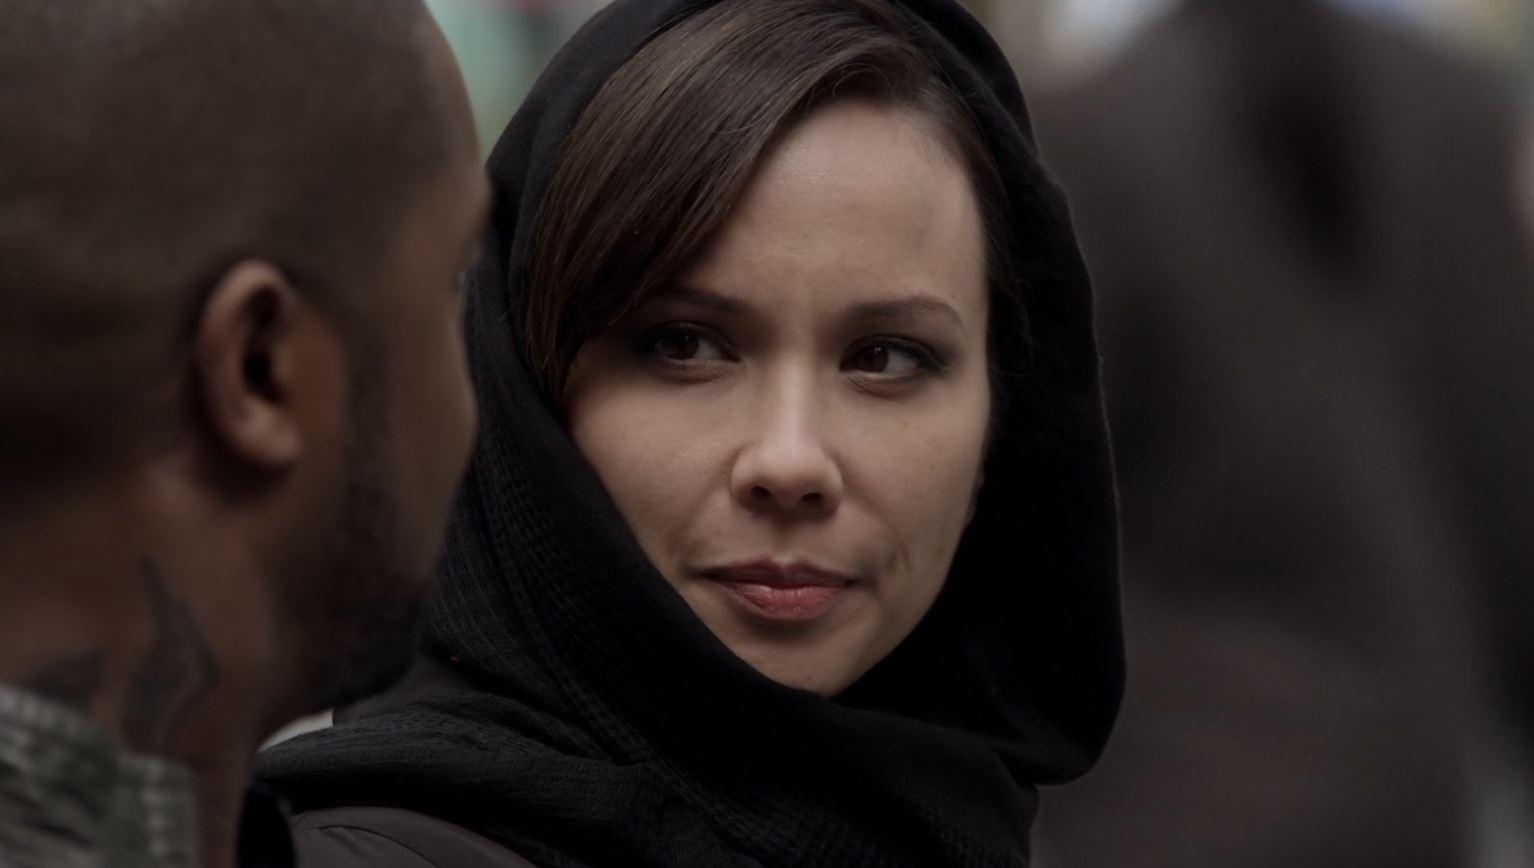 Continuum Season 3 Finale Last Minute Review - Lexa Doig as Sonya Valentine